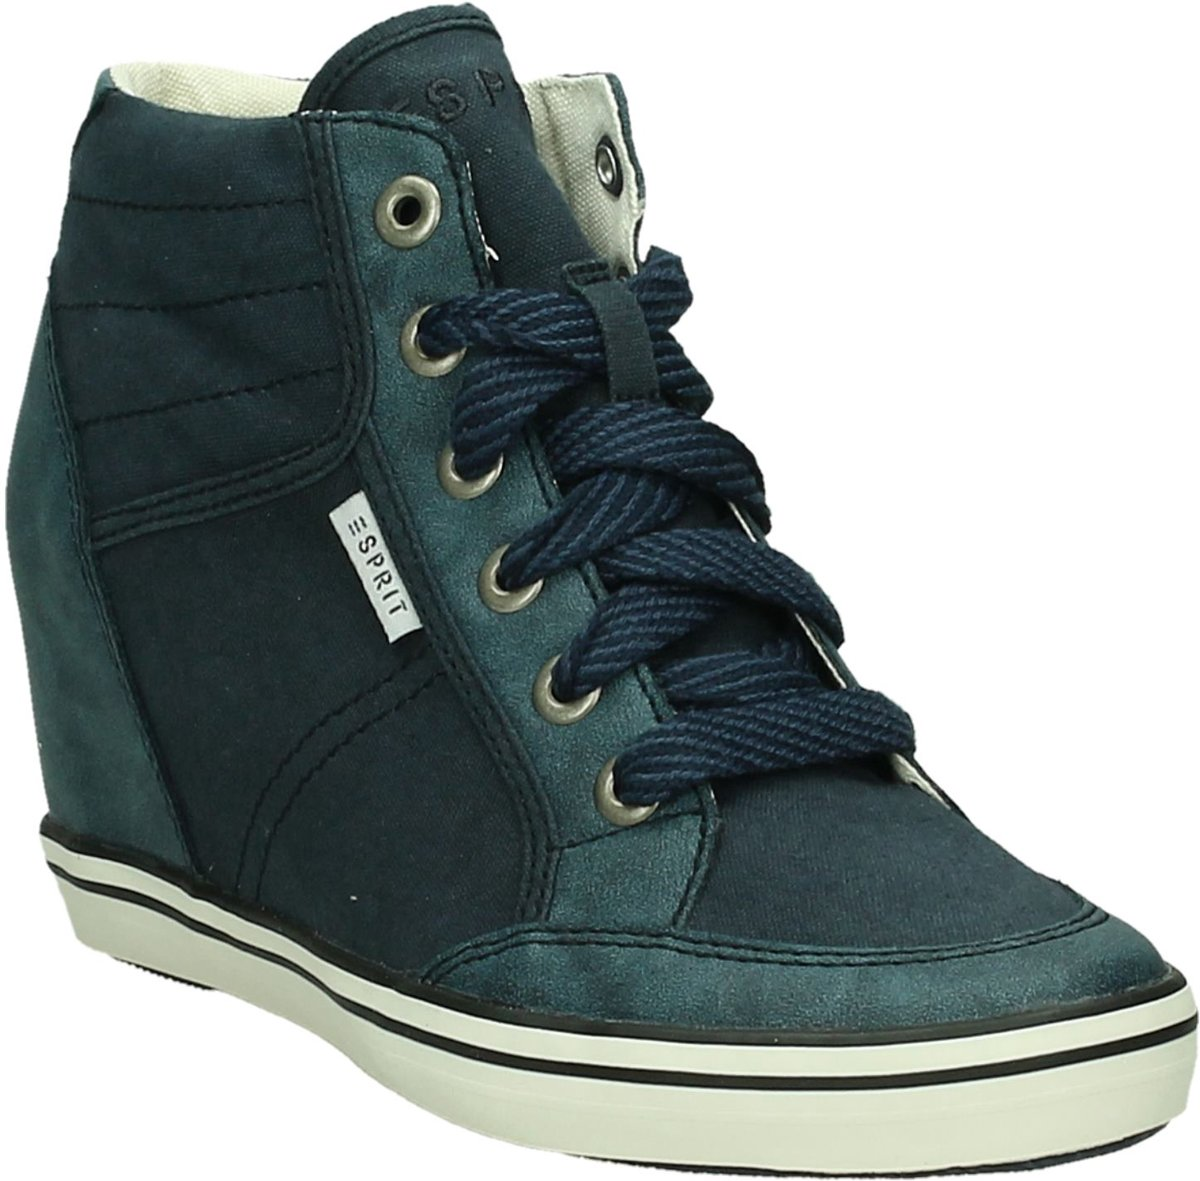 c6b86cc0d50 bol.com   Esprit - 036ek1w112 - Sneaker met sleehak - Dames - Maat 42 -  Blauw - Blue